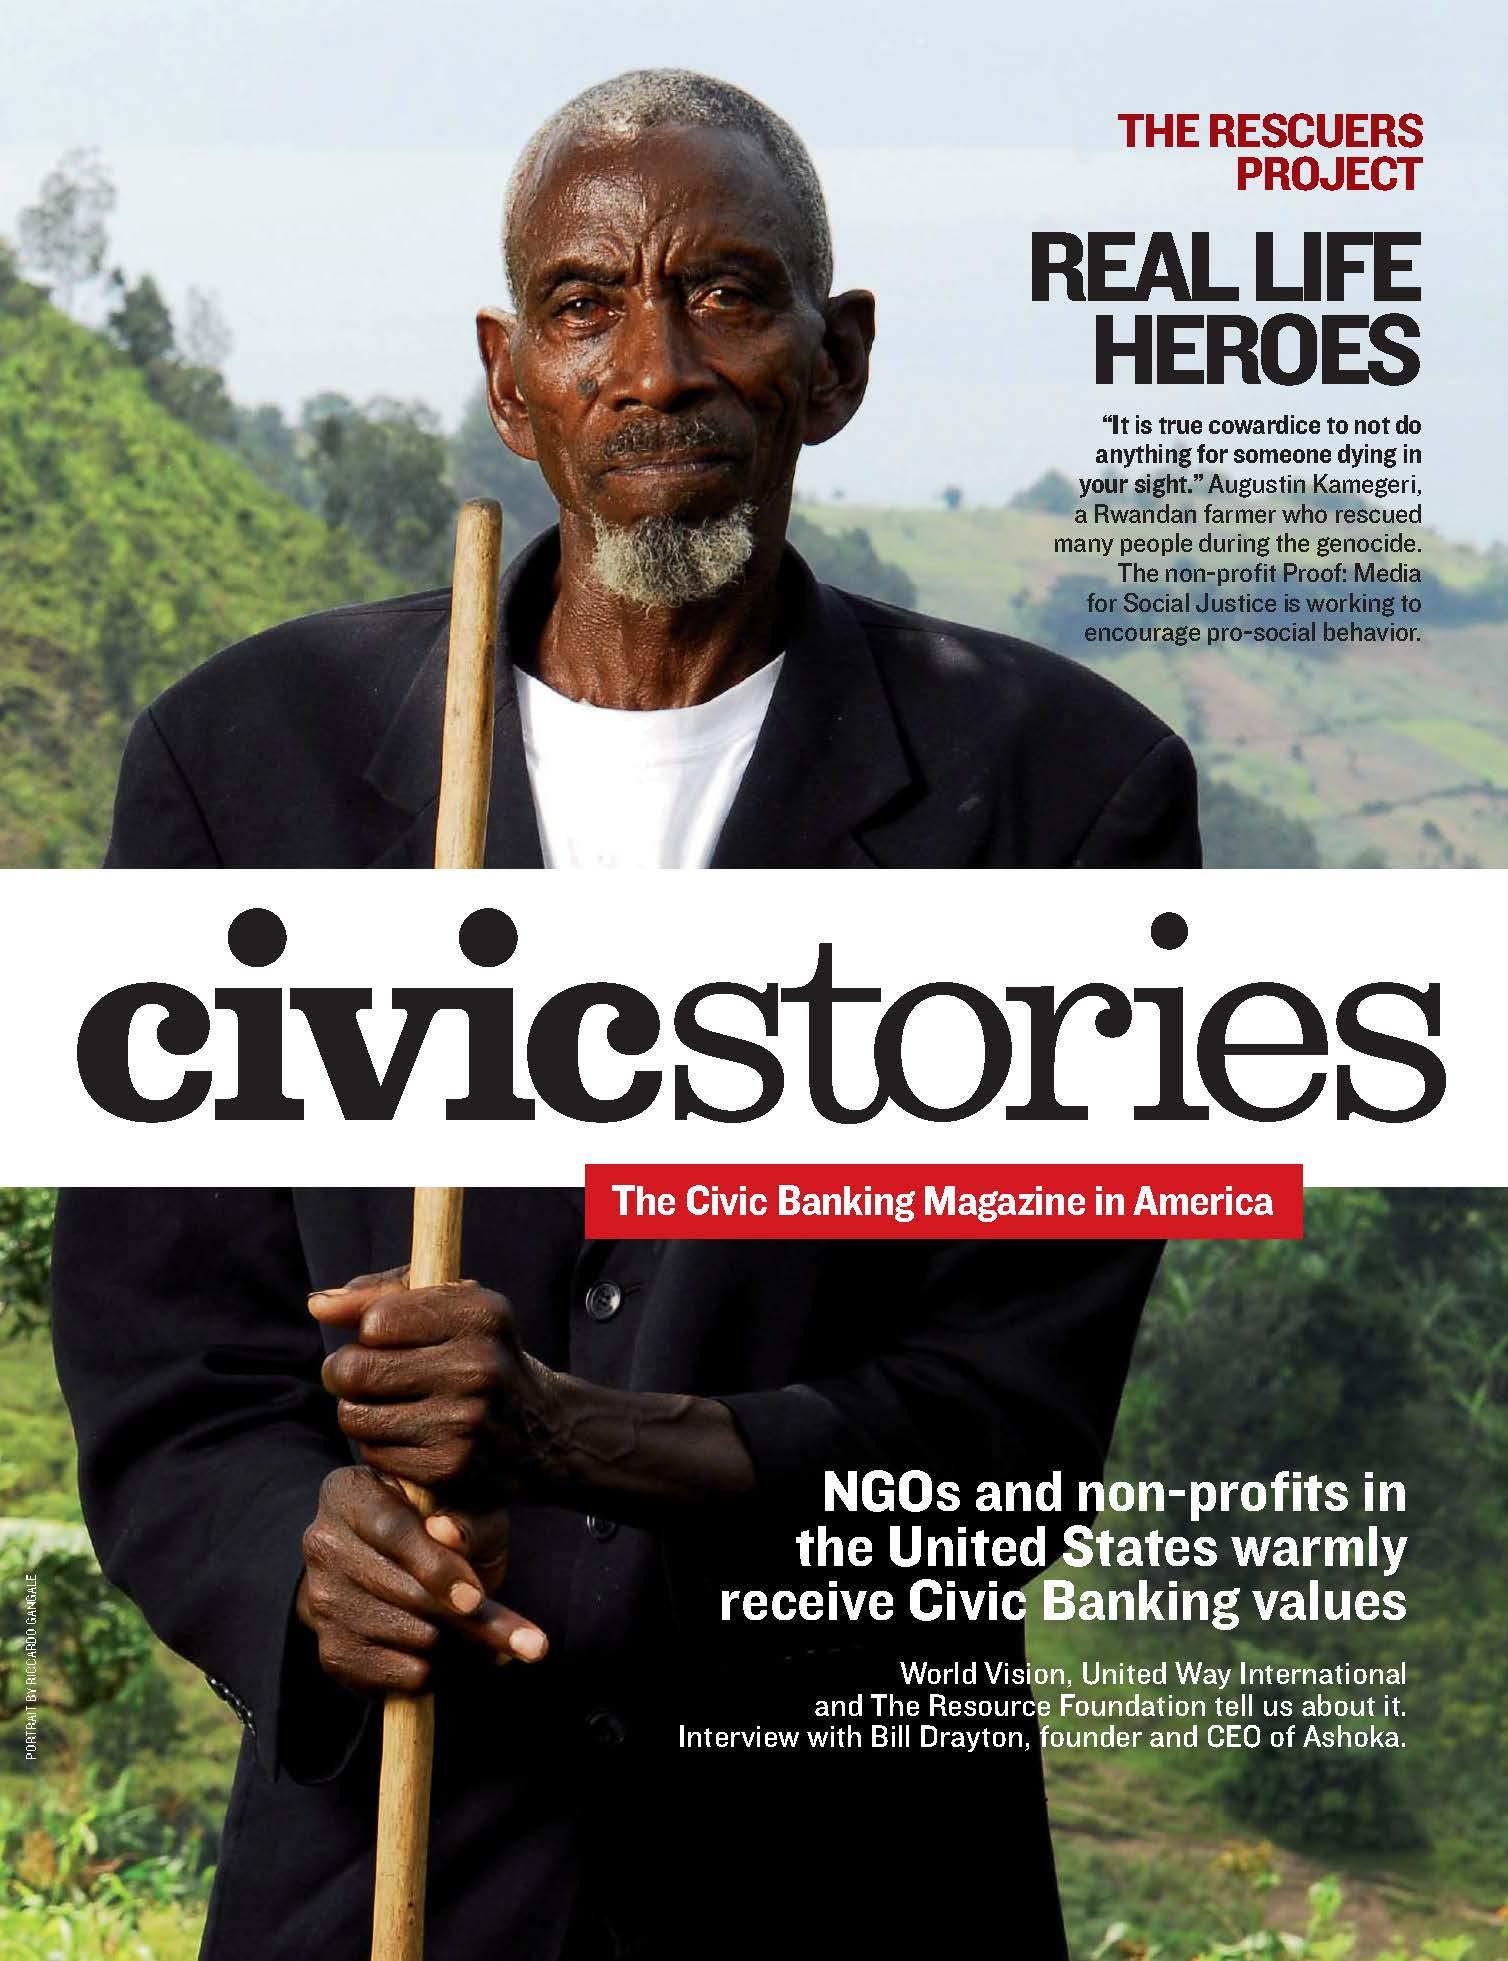 CivicBankingMagazine_Page_1.jpg